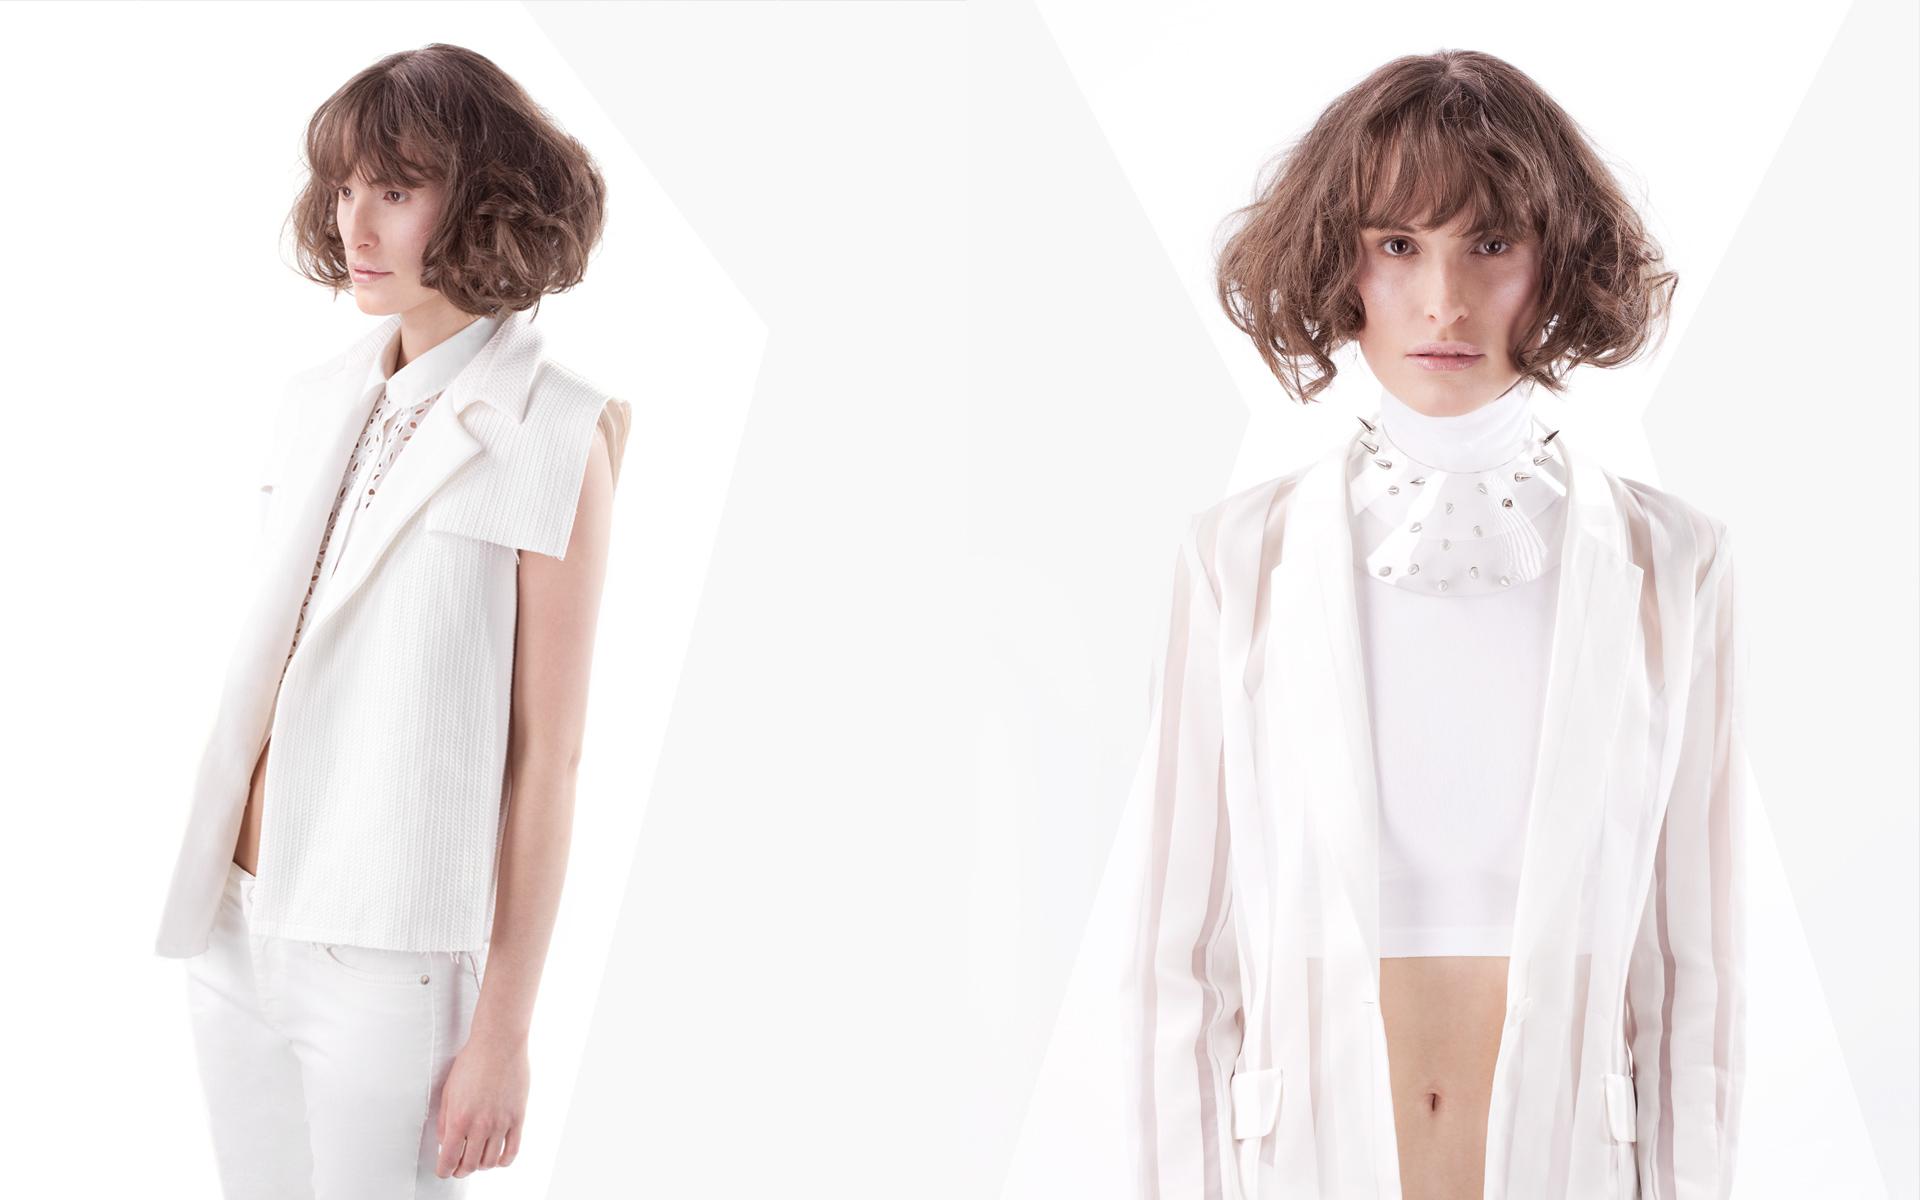 082_Fashion_F.Roncaldier